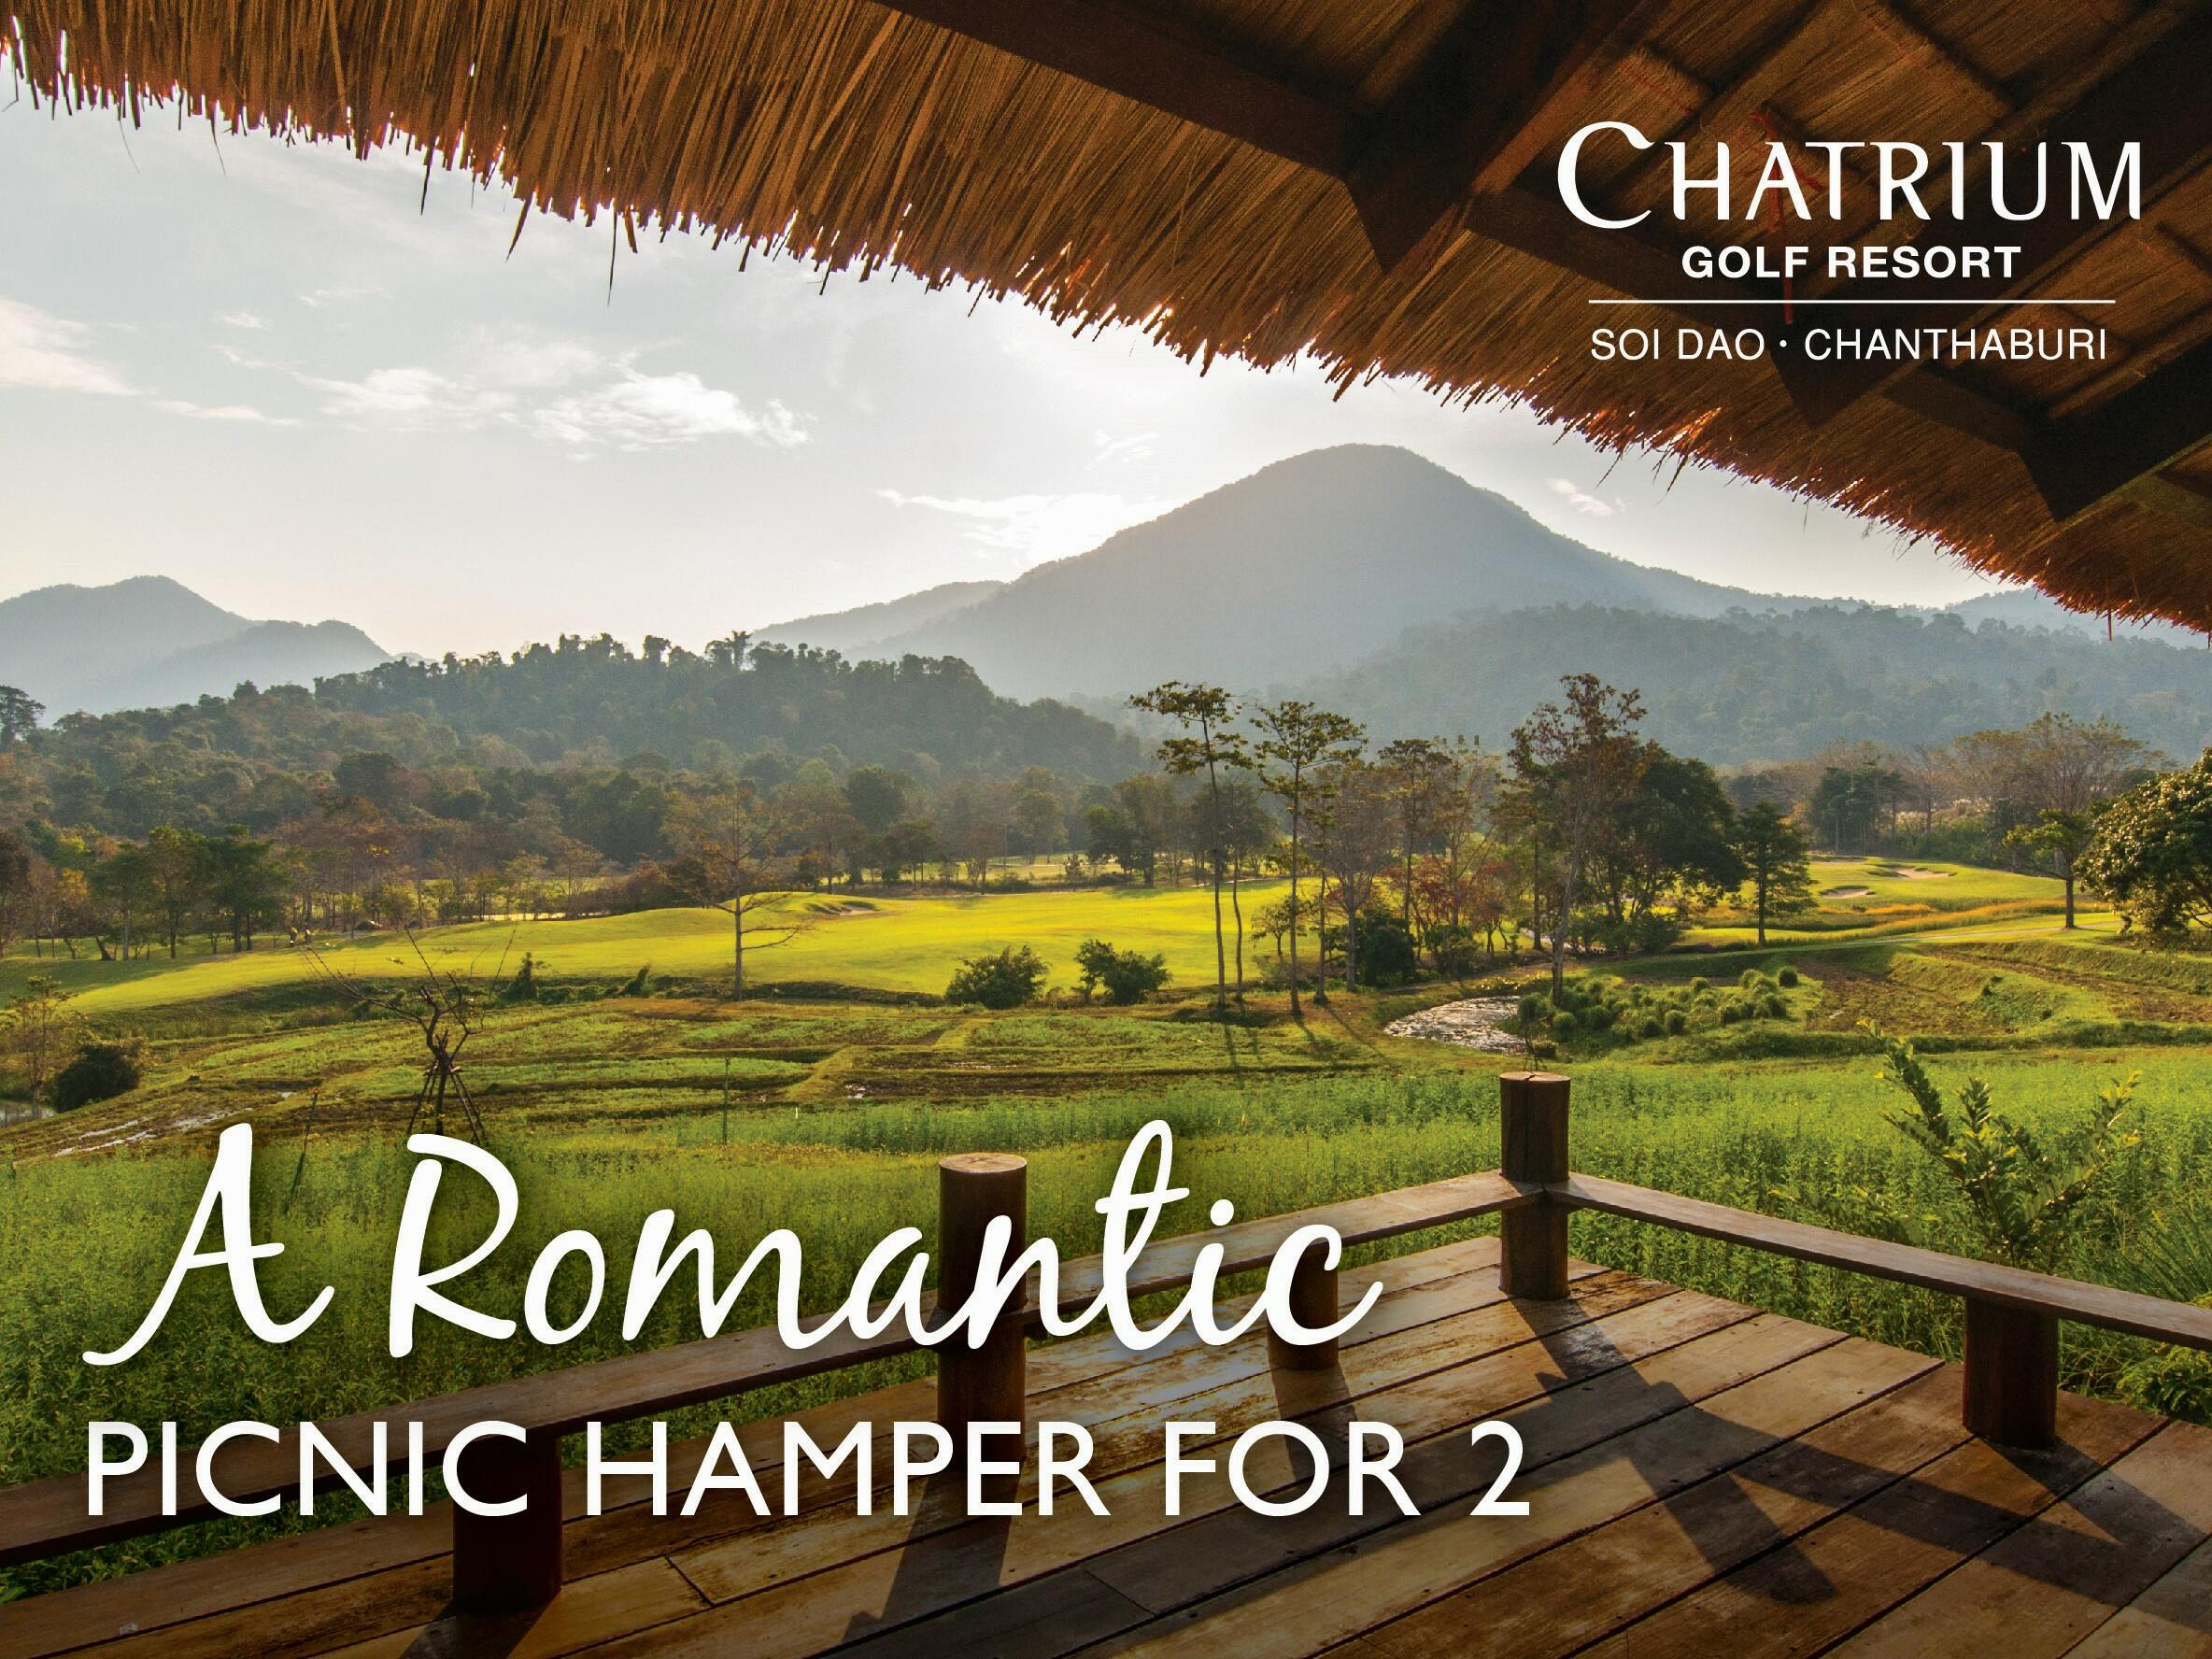 View of Romantic Picnic Hamper at Chatrium Golf Resort Soi Dao